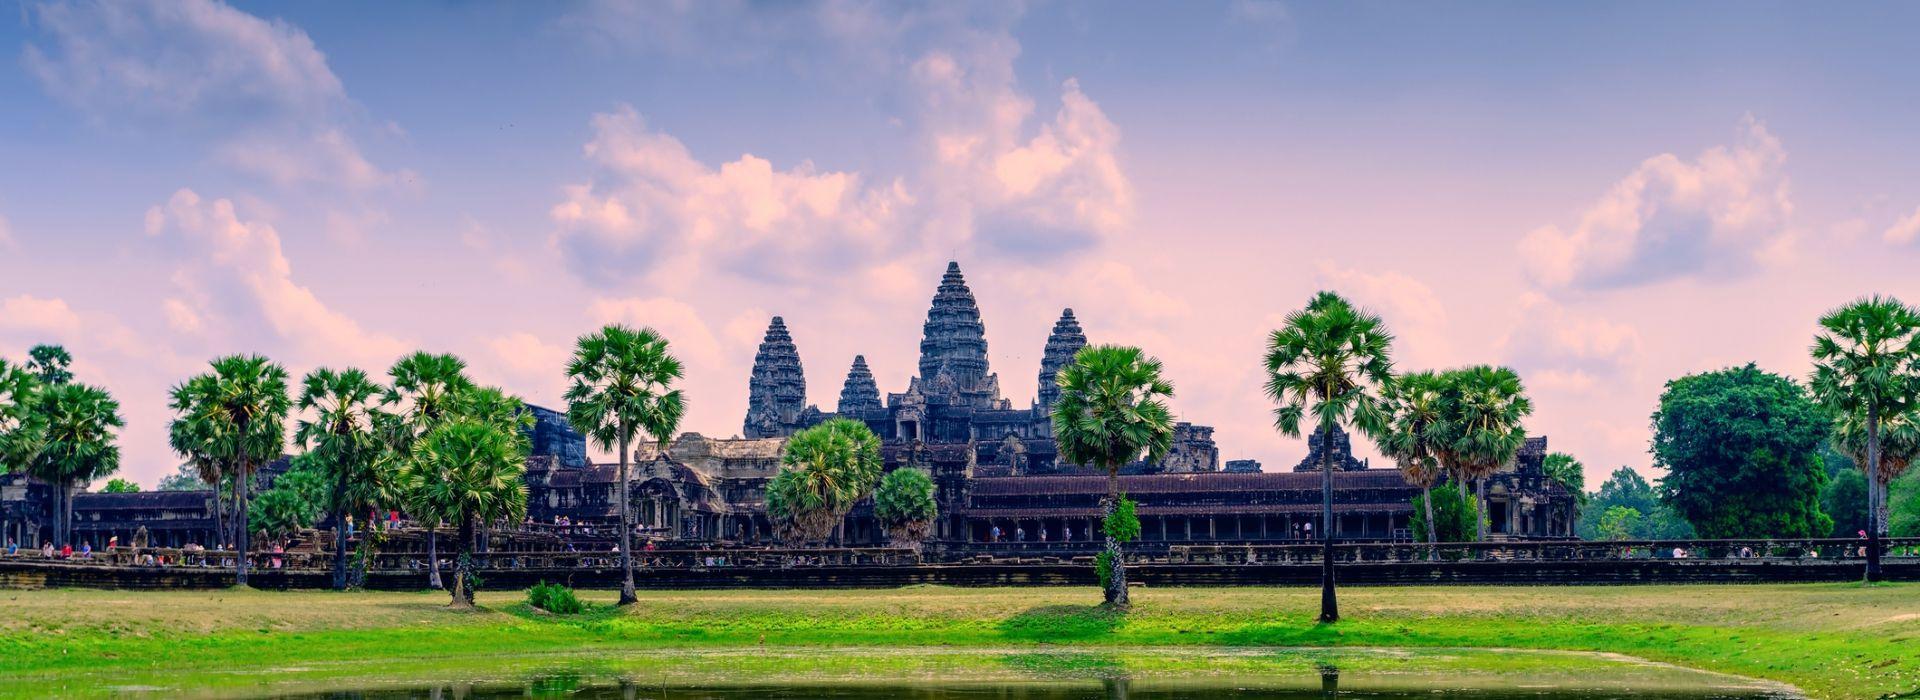 Trekking Tours in Cambodia